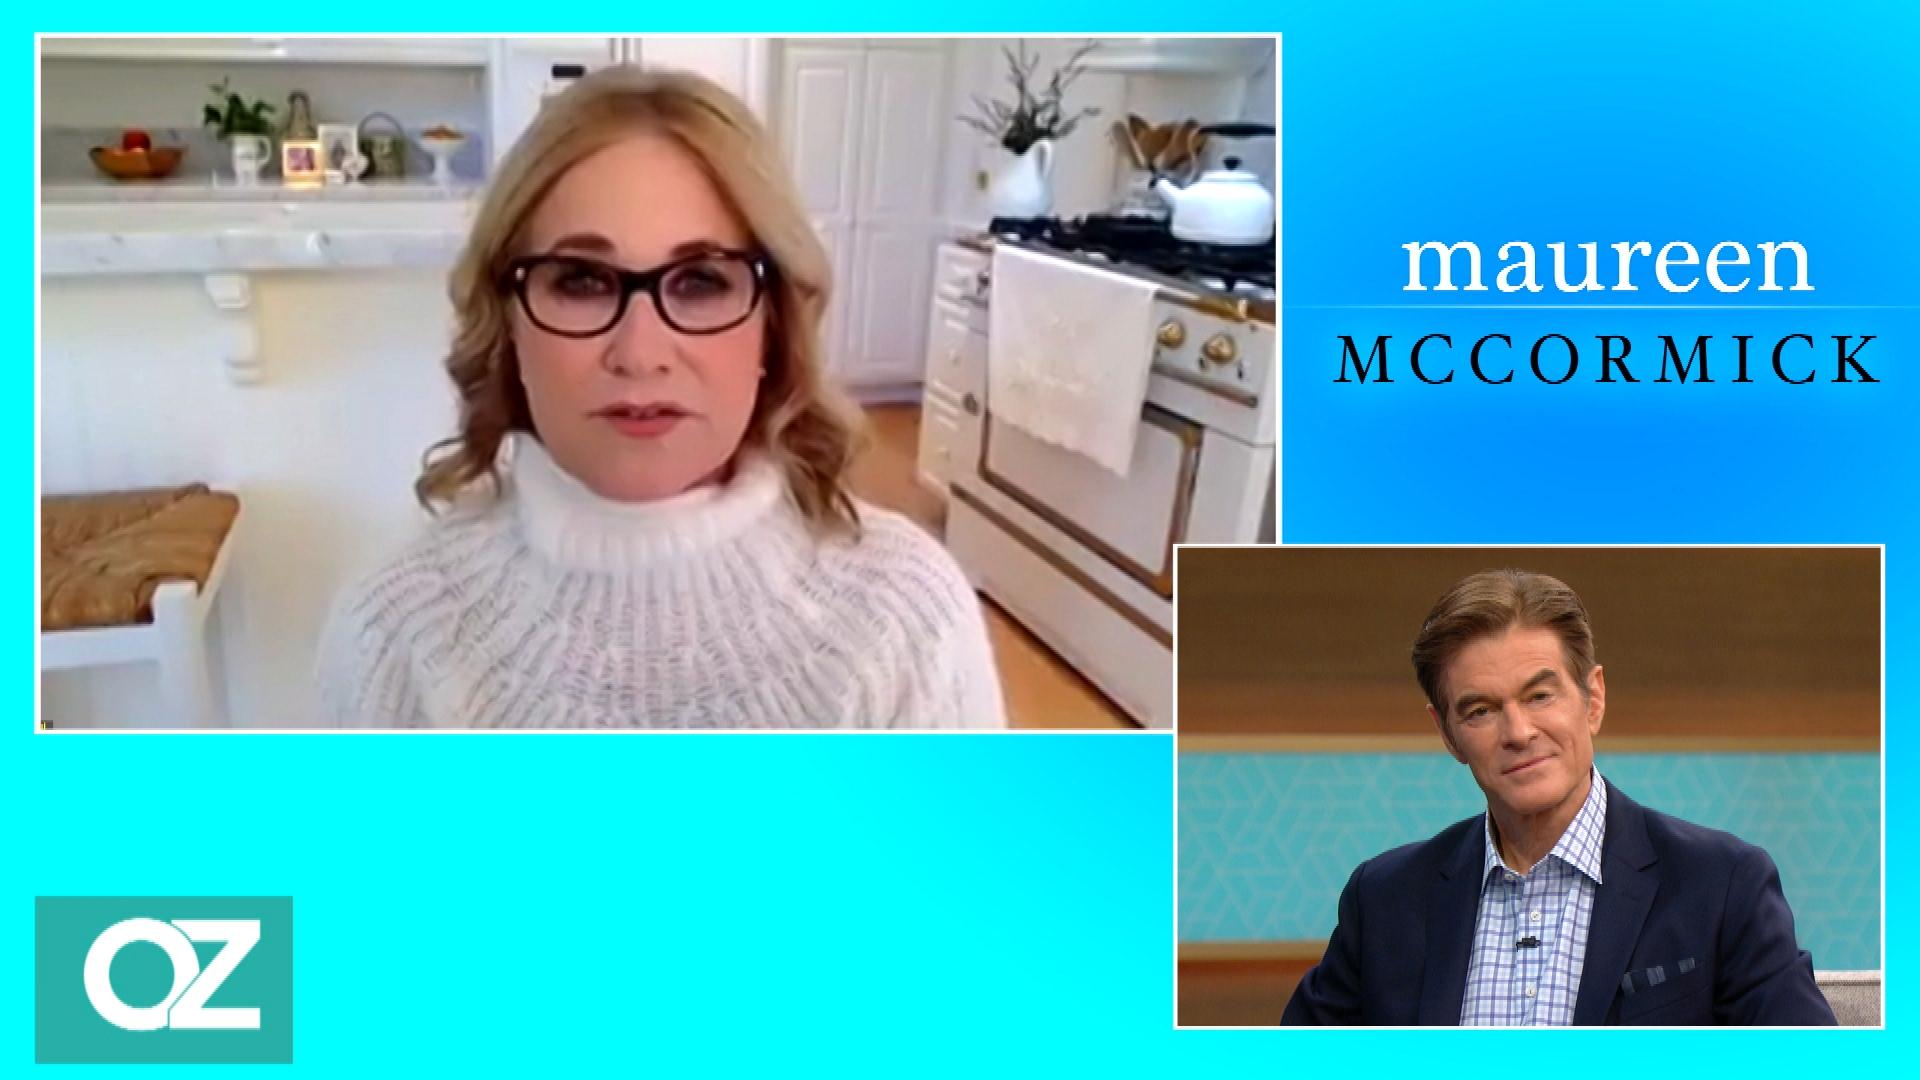 Maureen McCormick on 'The Dr. Oz Show'